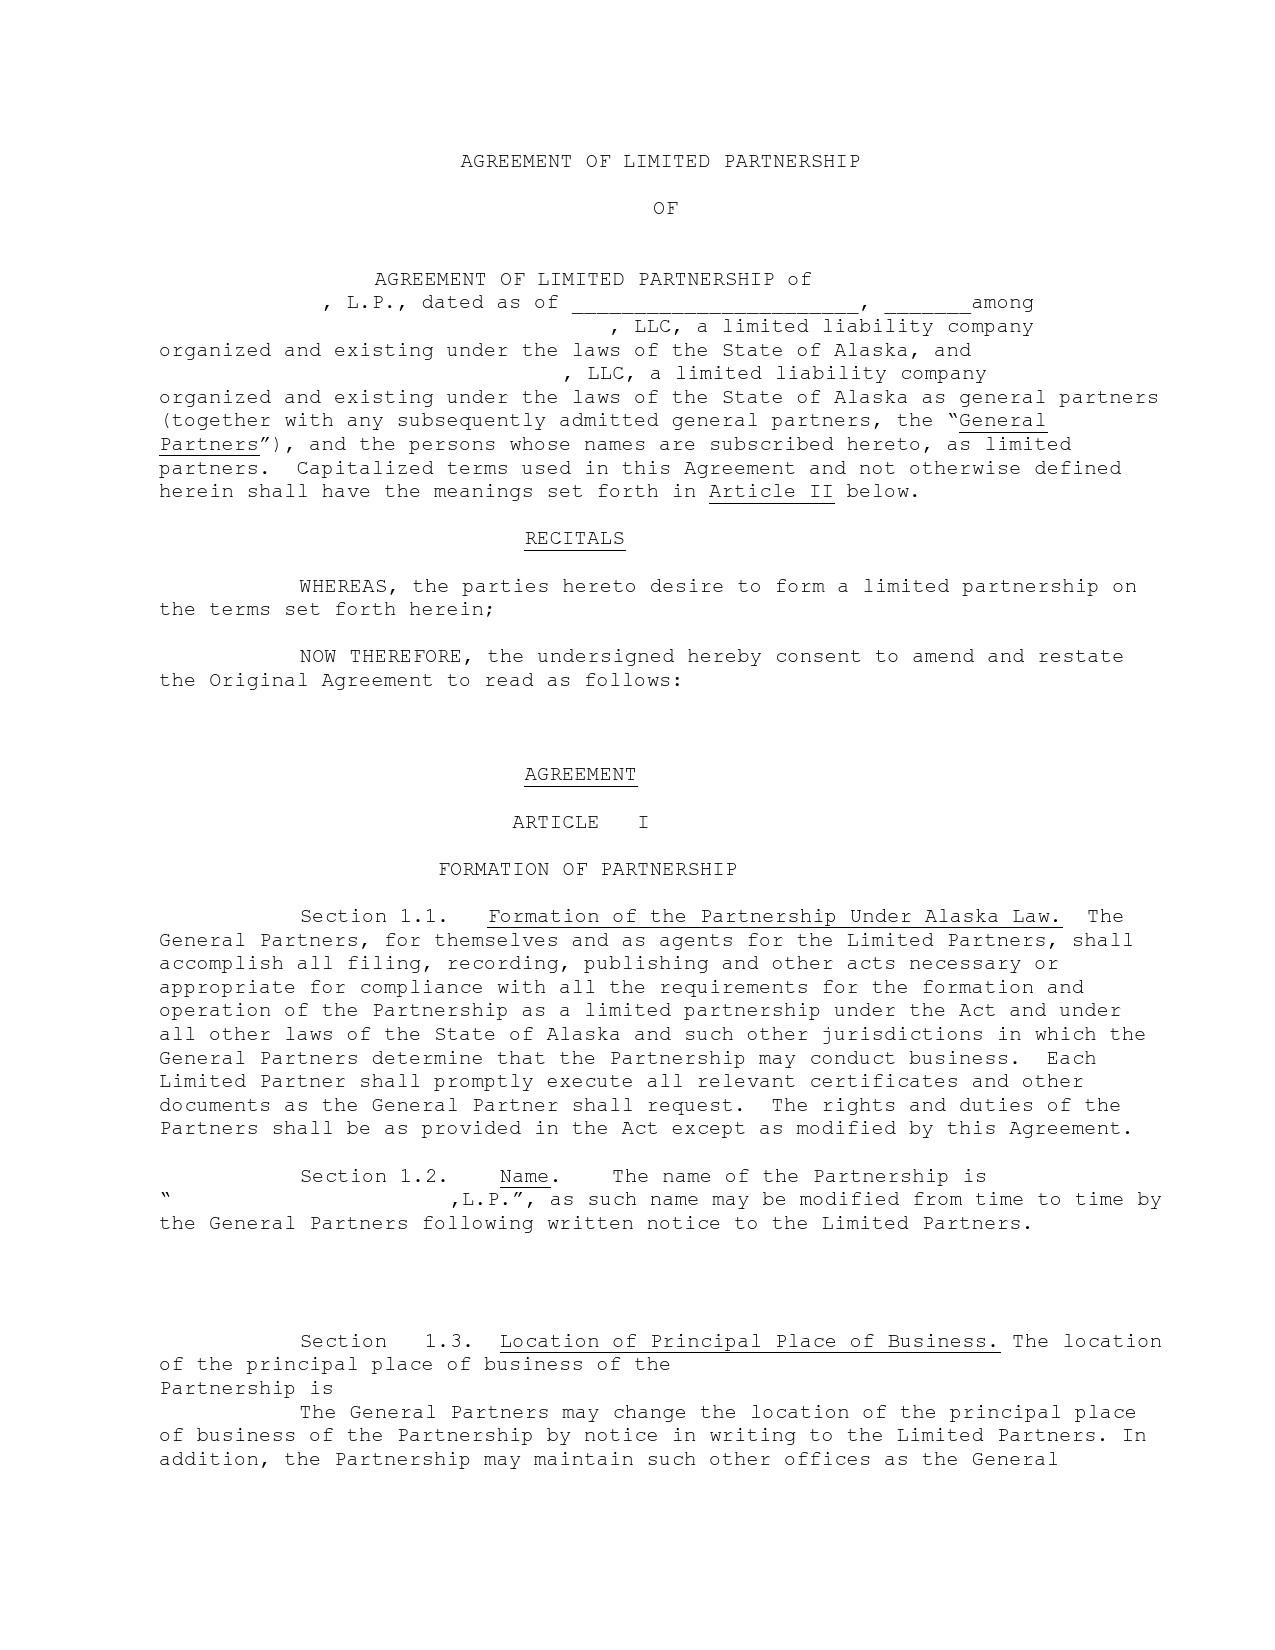 Free limited partnership agreement 30